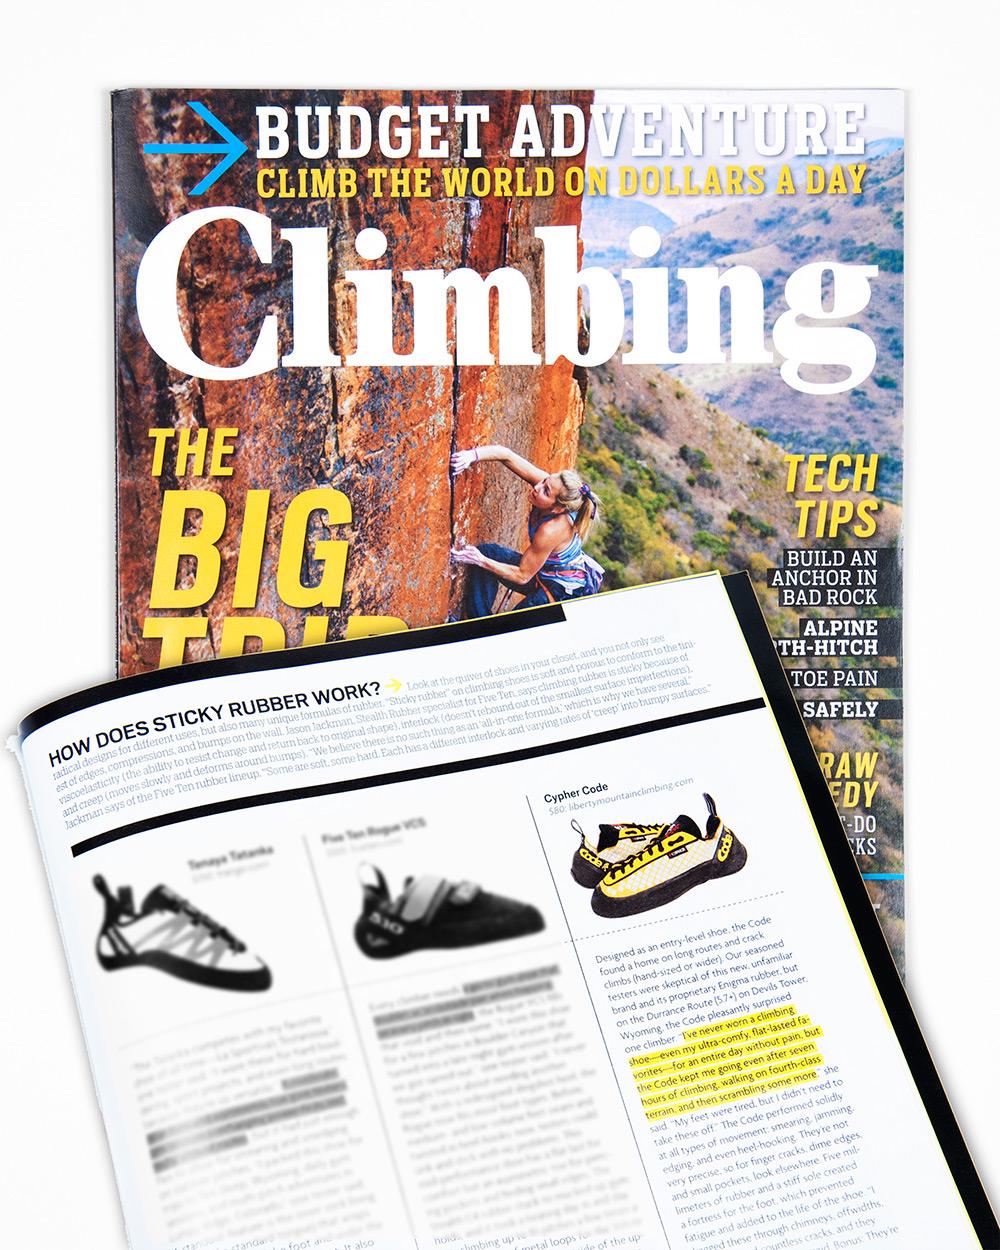 Climbing-Magazine_Oct-2013_Cypher-Code.jpg